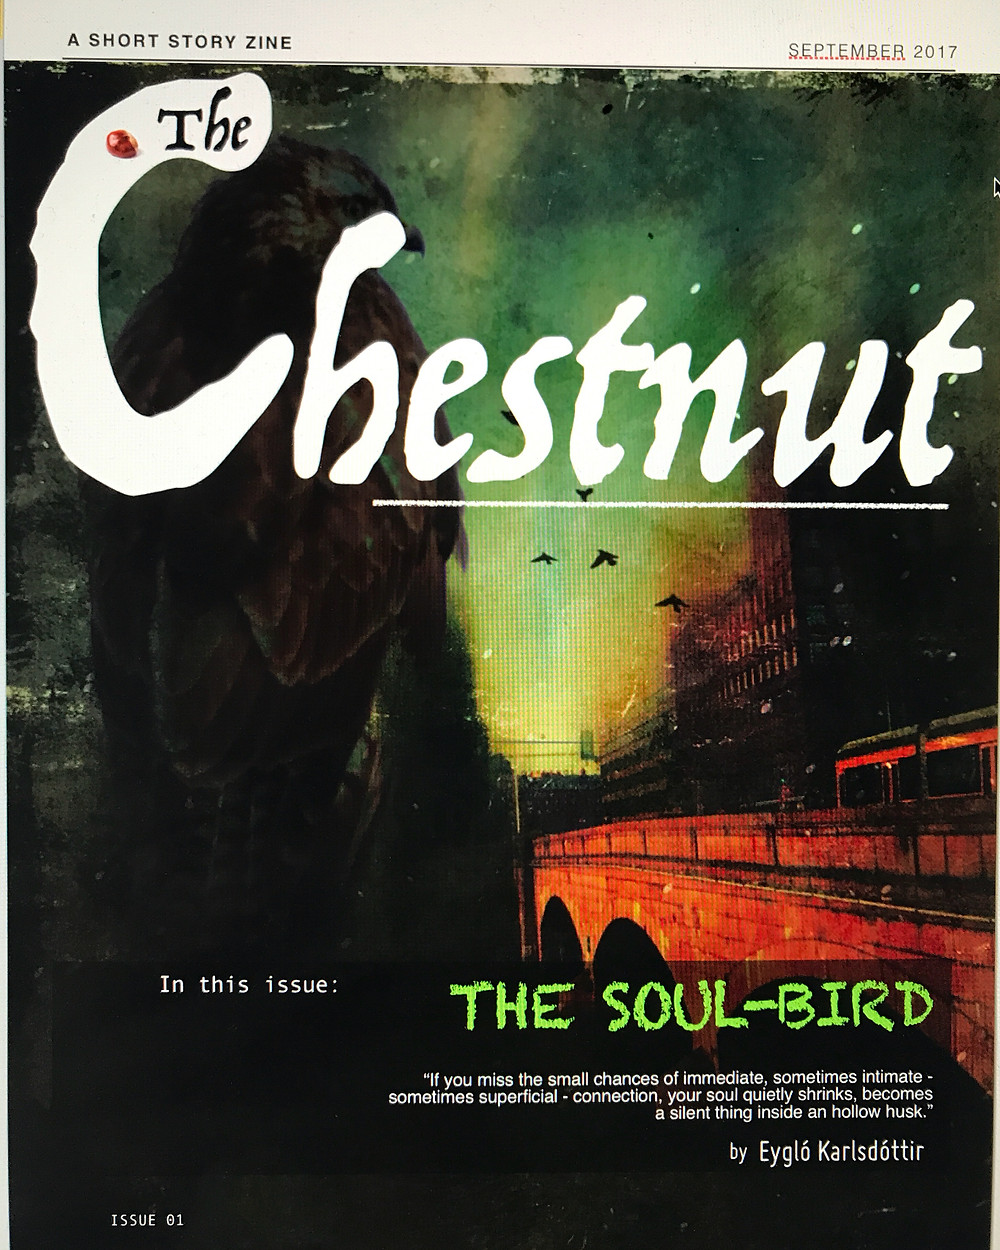 The Chestnut